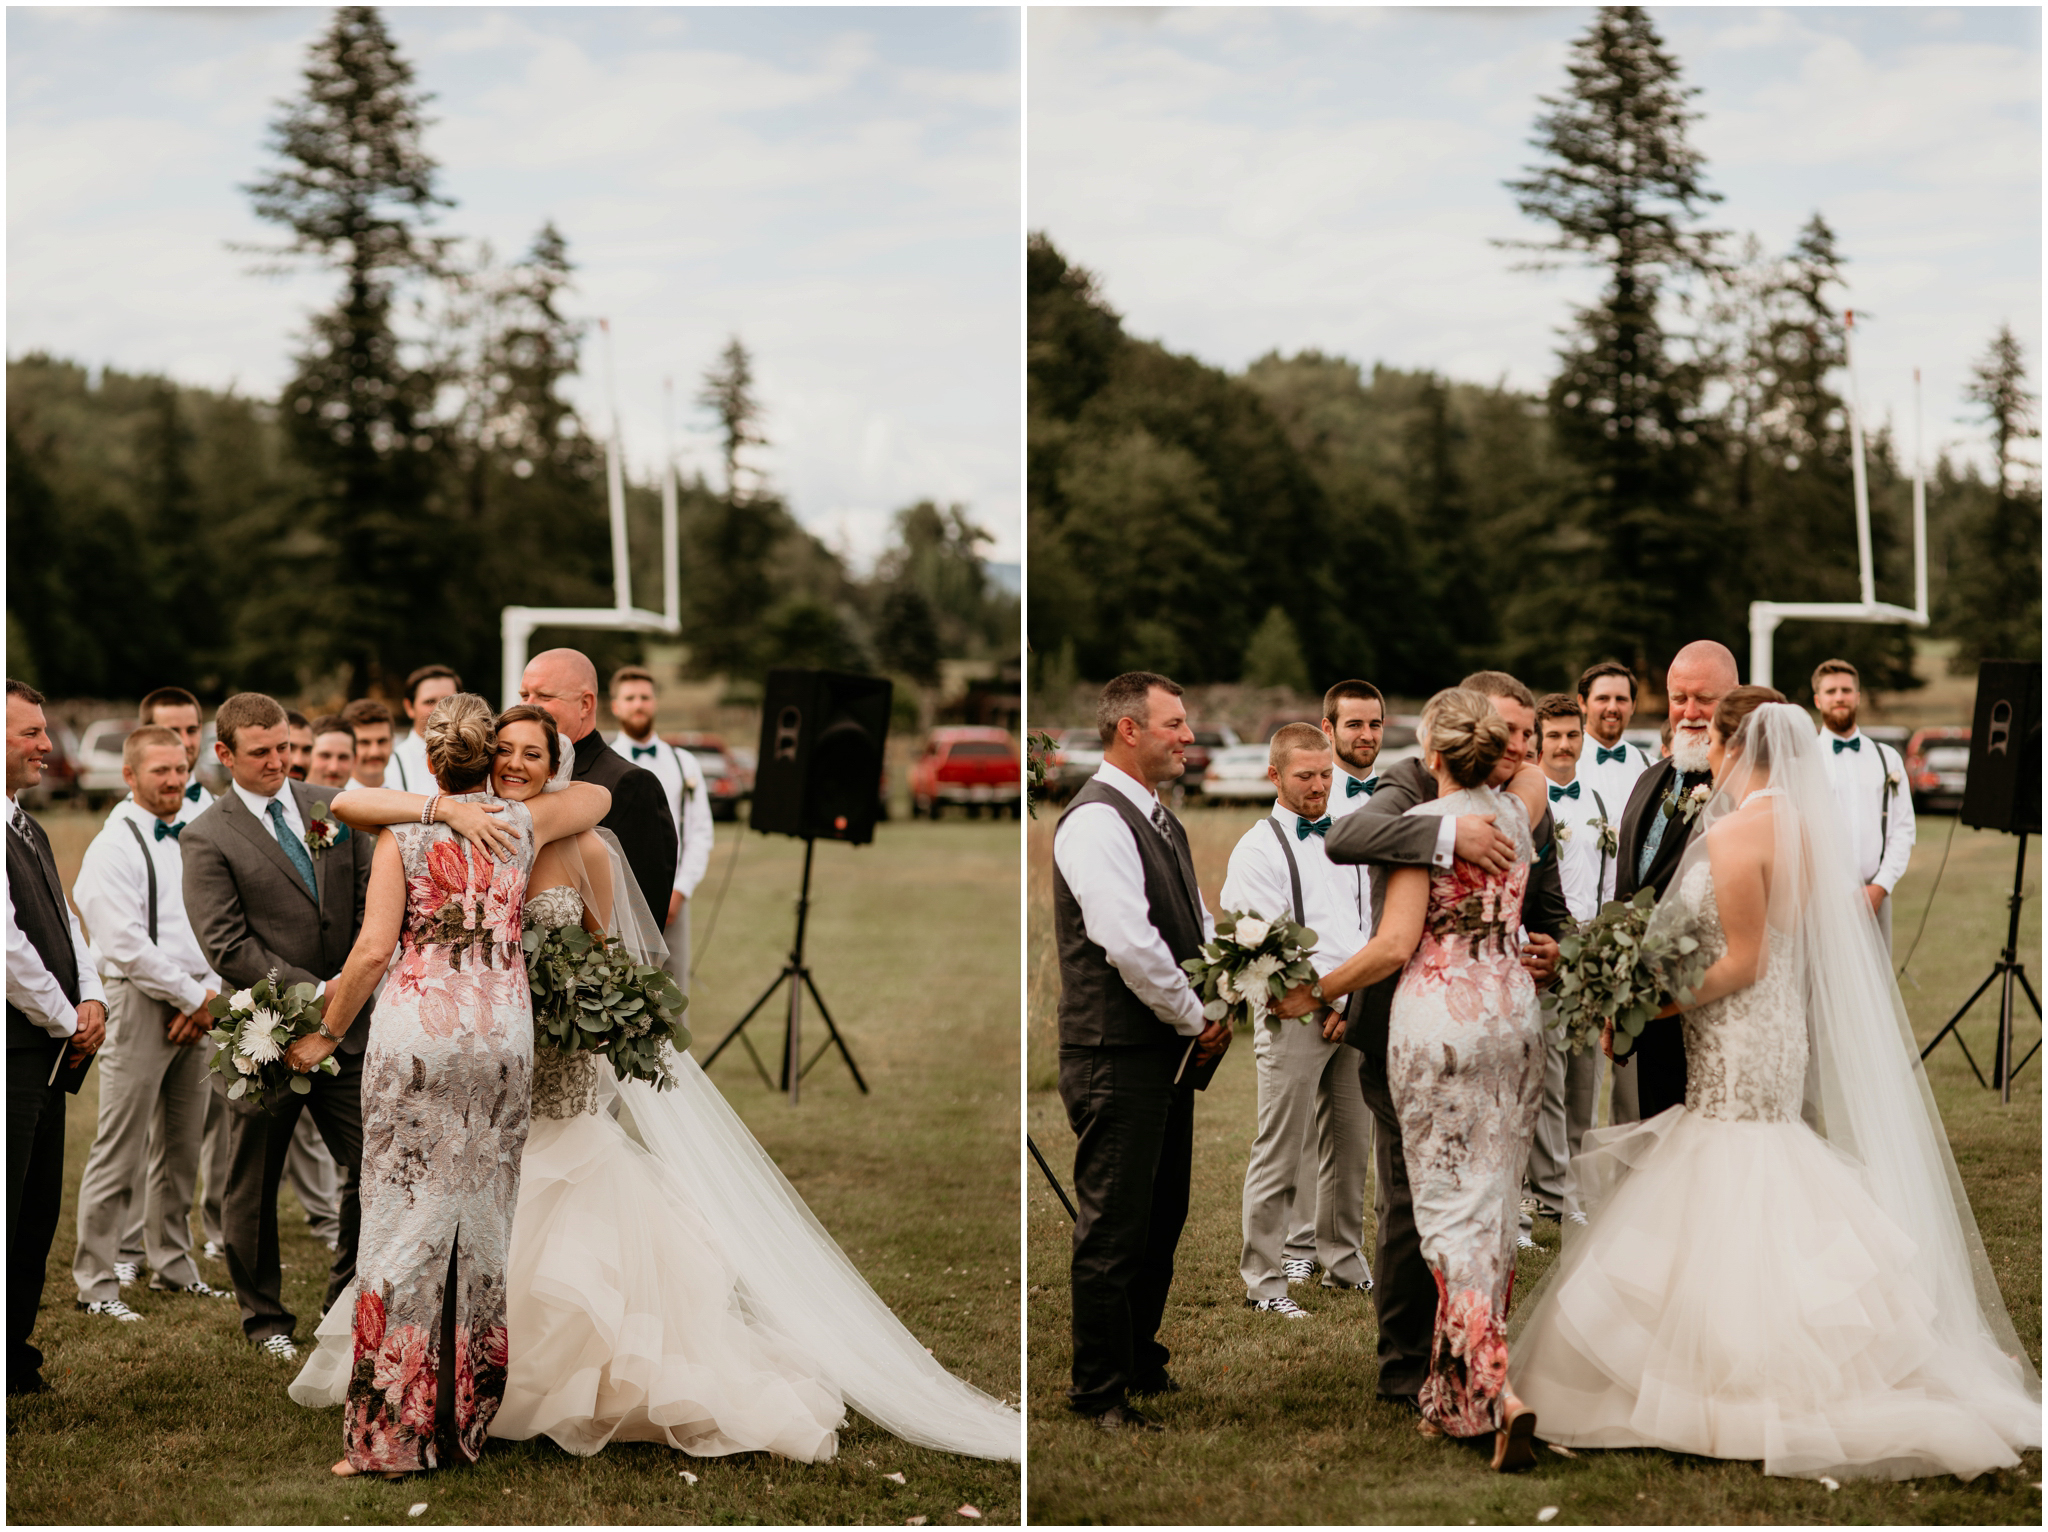 alex-and-matthew-three-cs-farm-venue-seattle-wedding-photographer-102.jpg